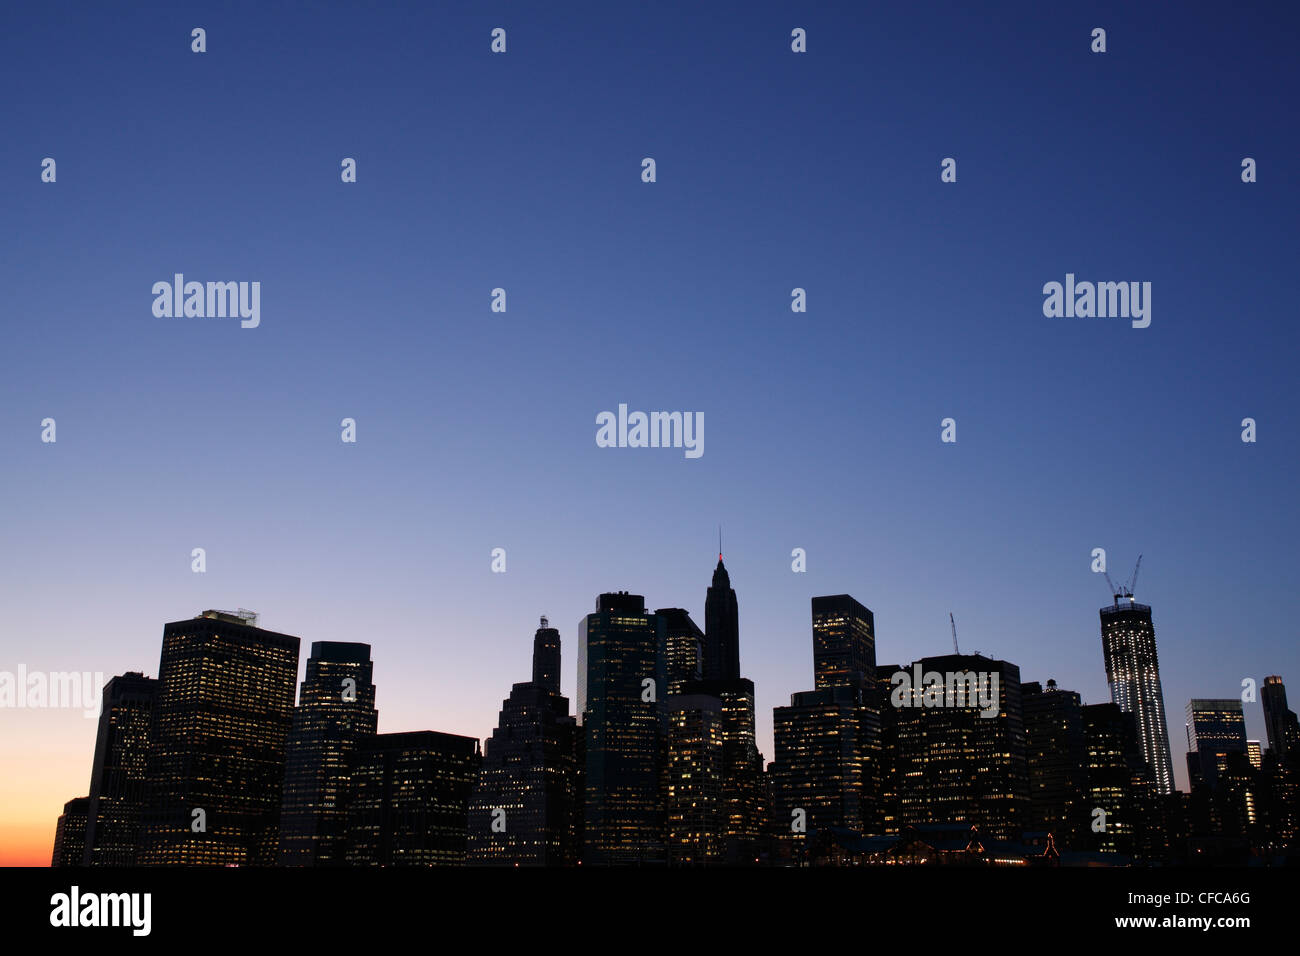 Manhattan evening skyline - Stock Image